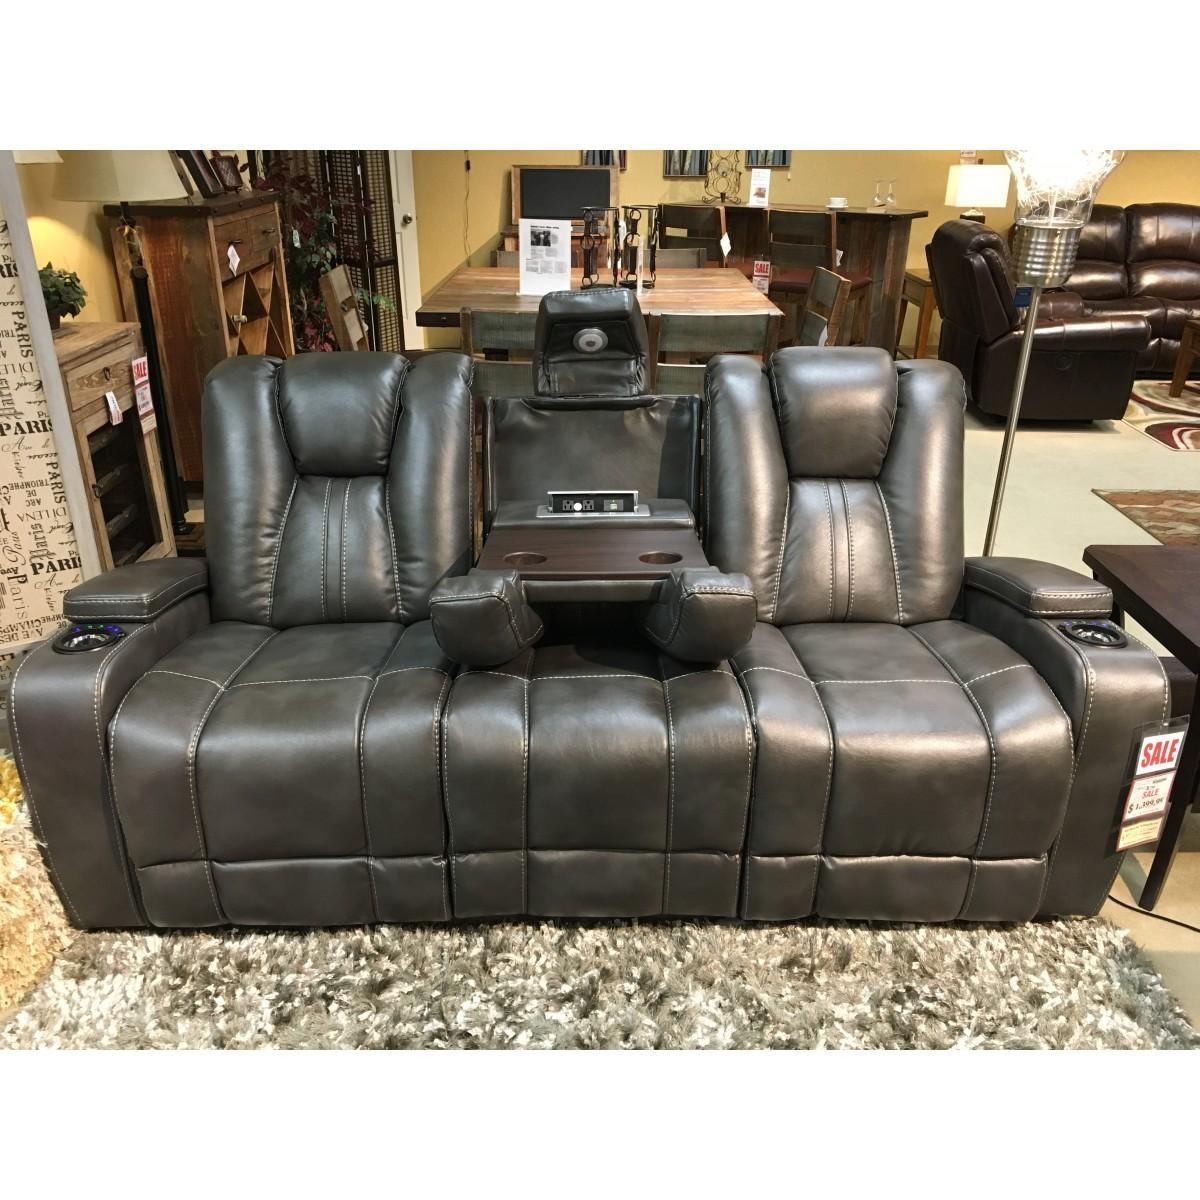 Furniture Bolero Slate Power Reclining Entertainment Sofa Pertaining To Cheers Recliner Sofas (View 2 of 8)